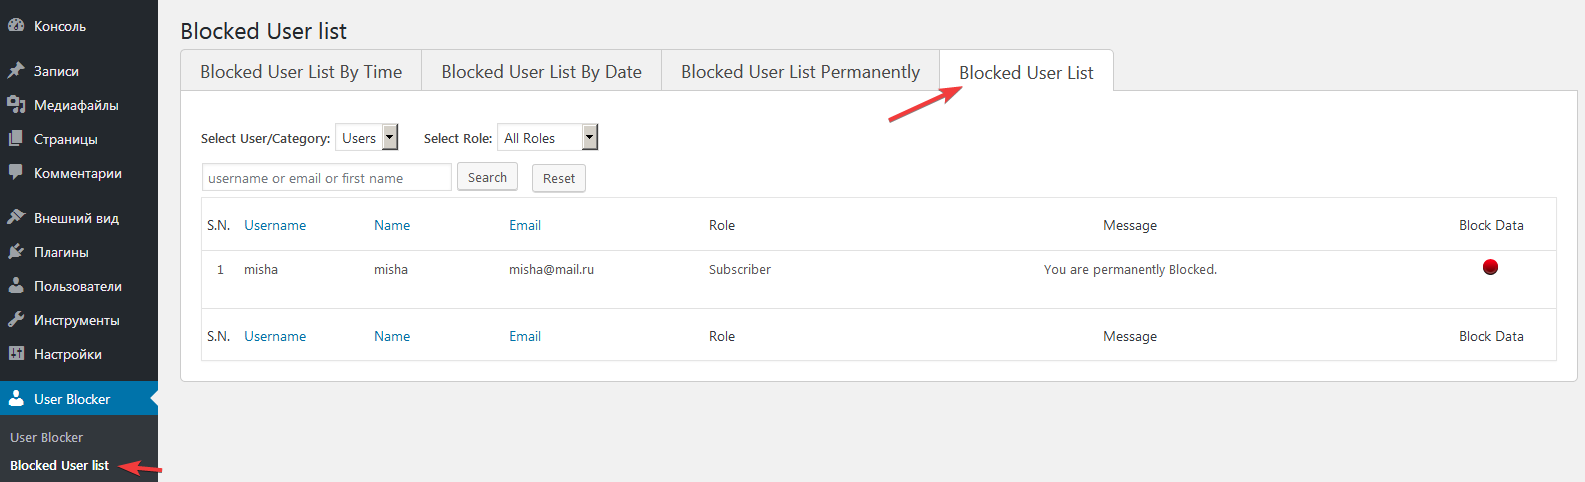 Страница настроек плагина User Blocker